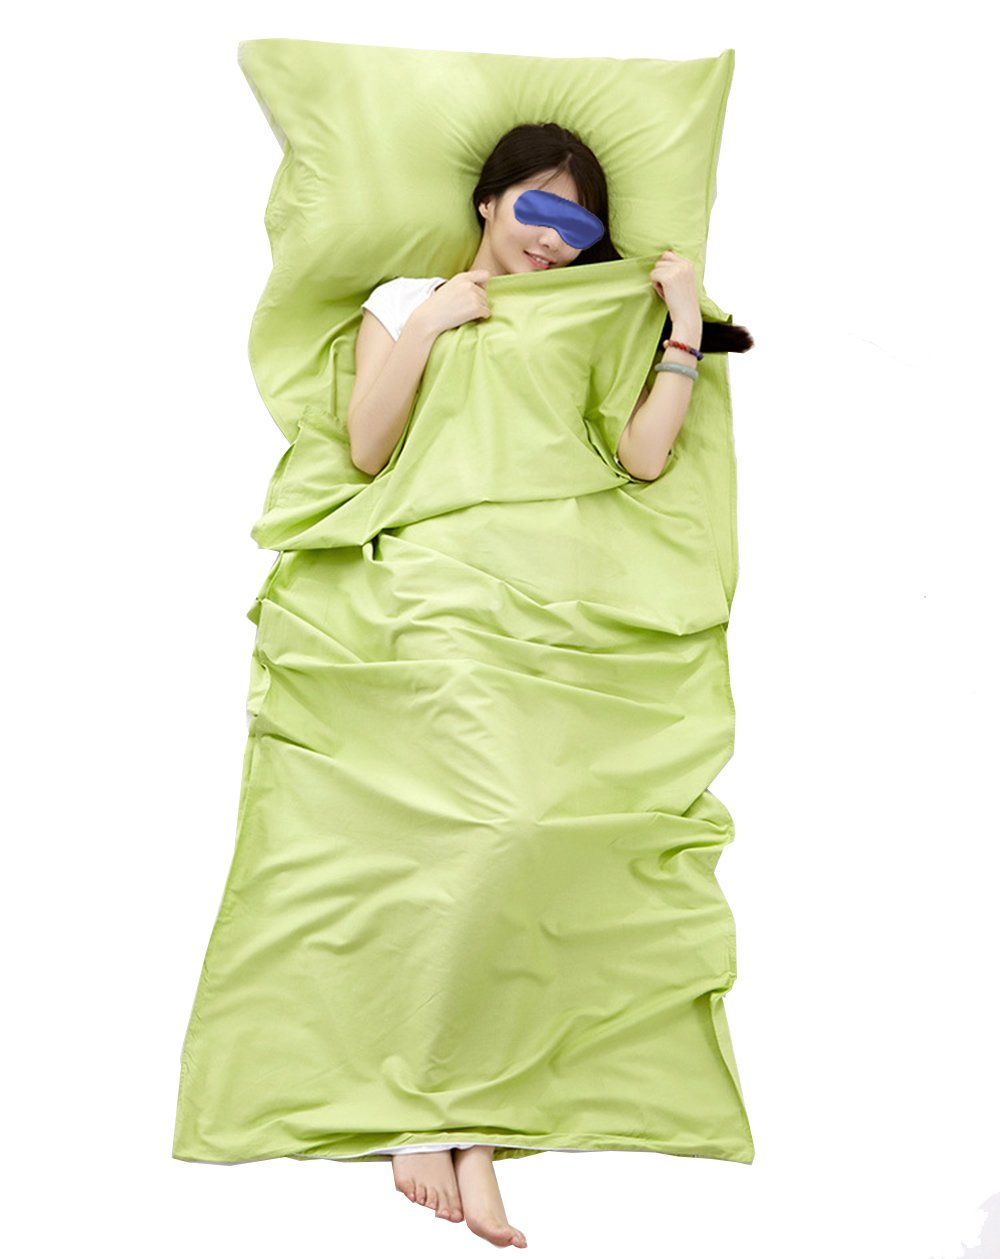 Share Maison 100% Cotton Sleeping Bag Liner Travel Sheet Camping Sleep Sheet Single/Double (Green, 87''x31'') by Share Maison